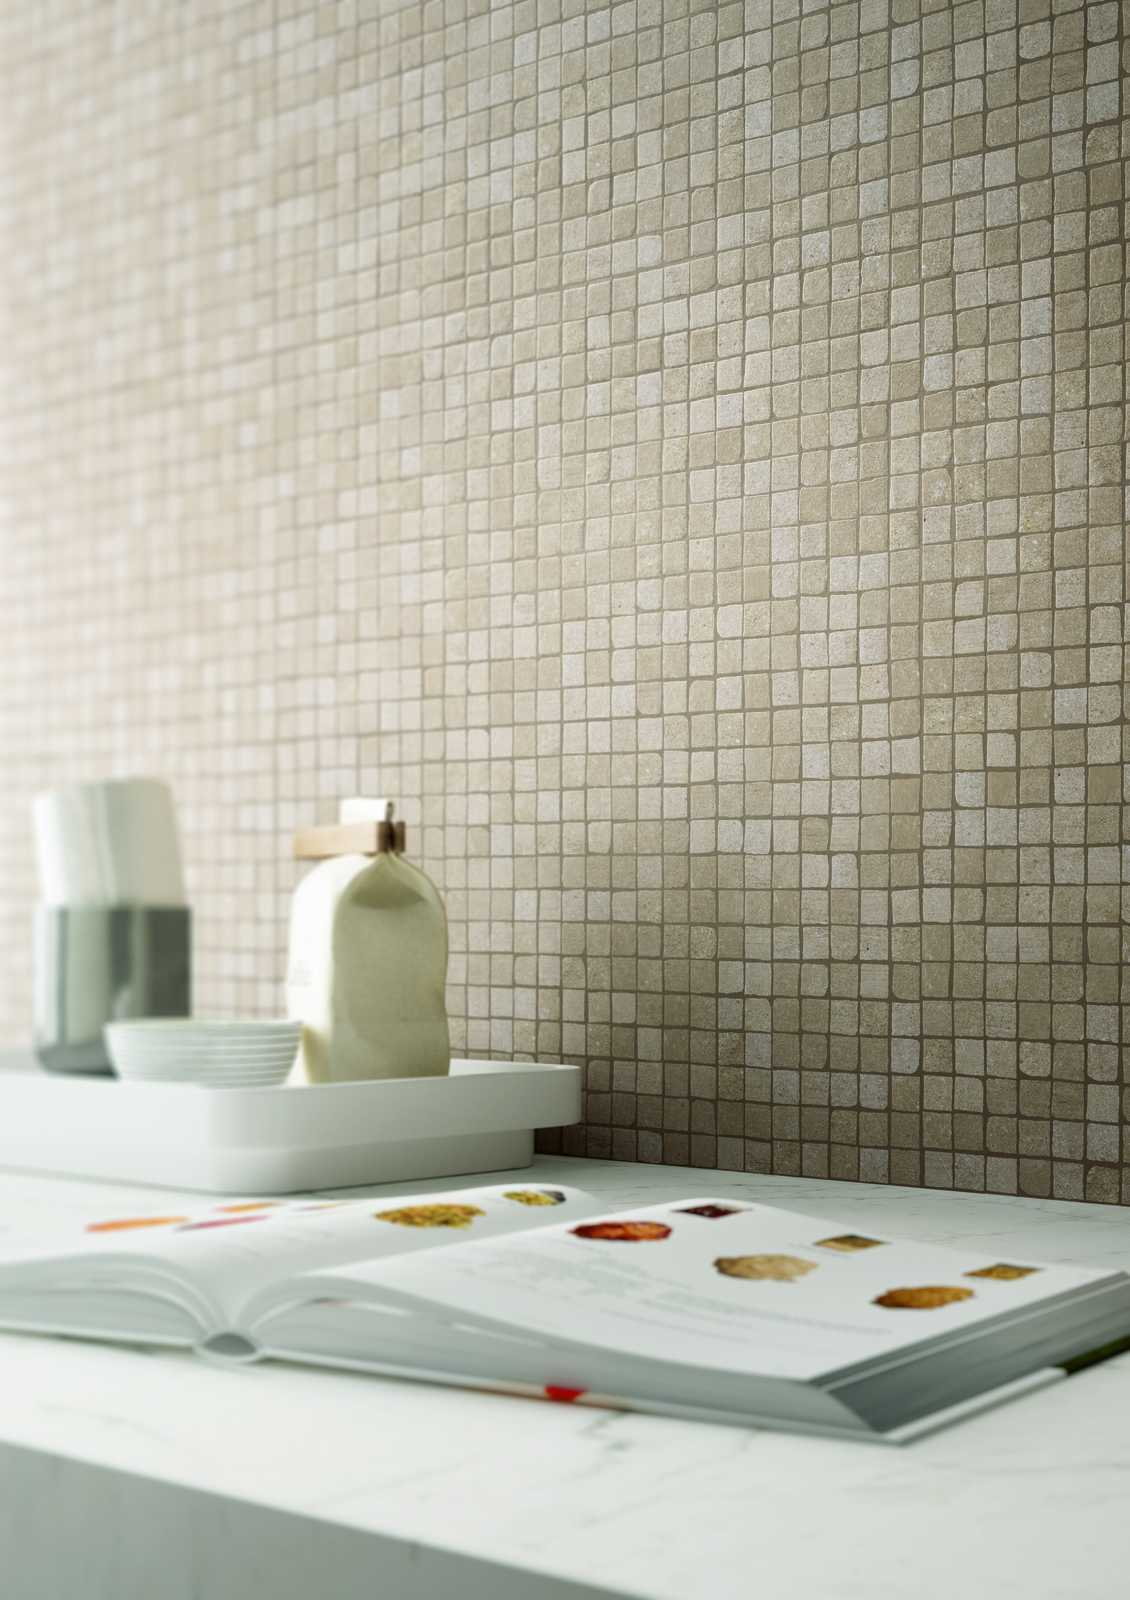 Plaster porcelain stoneware flooring marazzi plaster ceramic tiles marazzi7223 doublecrazyfo Gallery